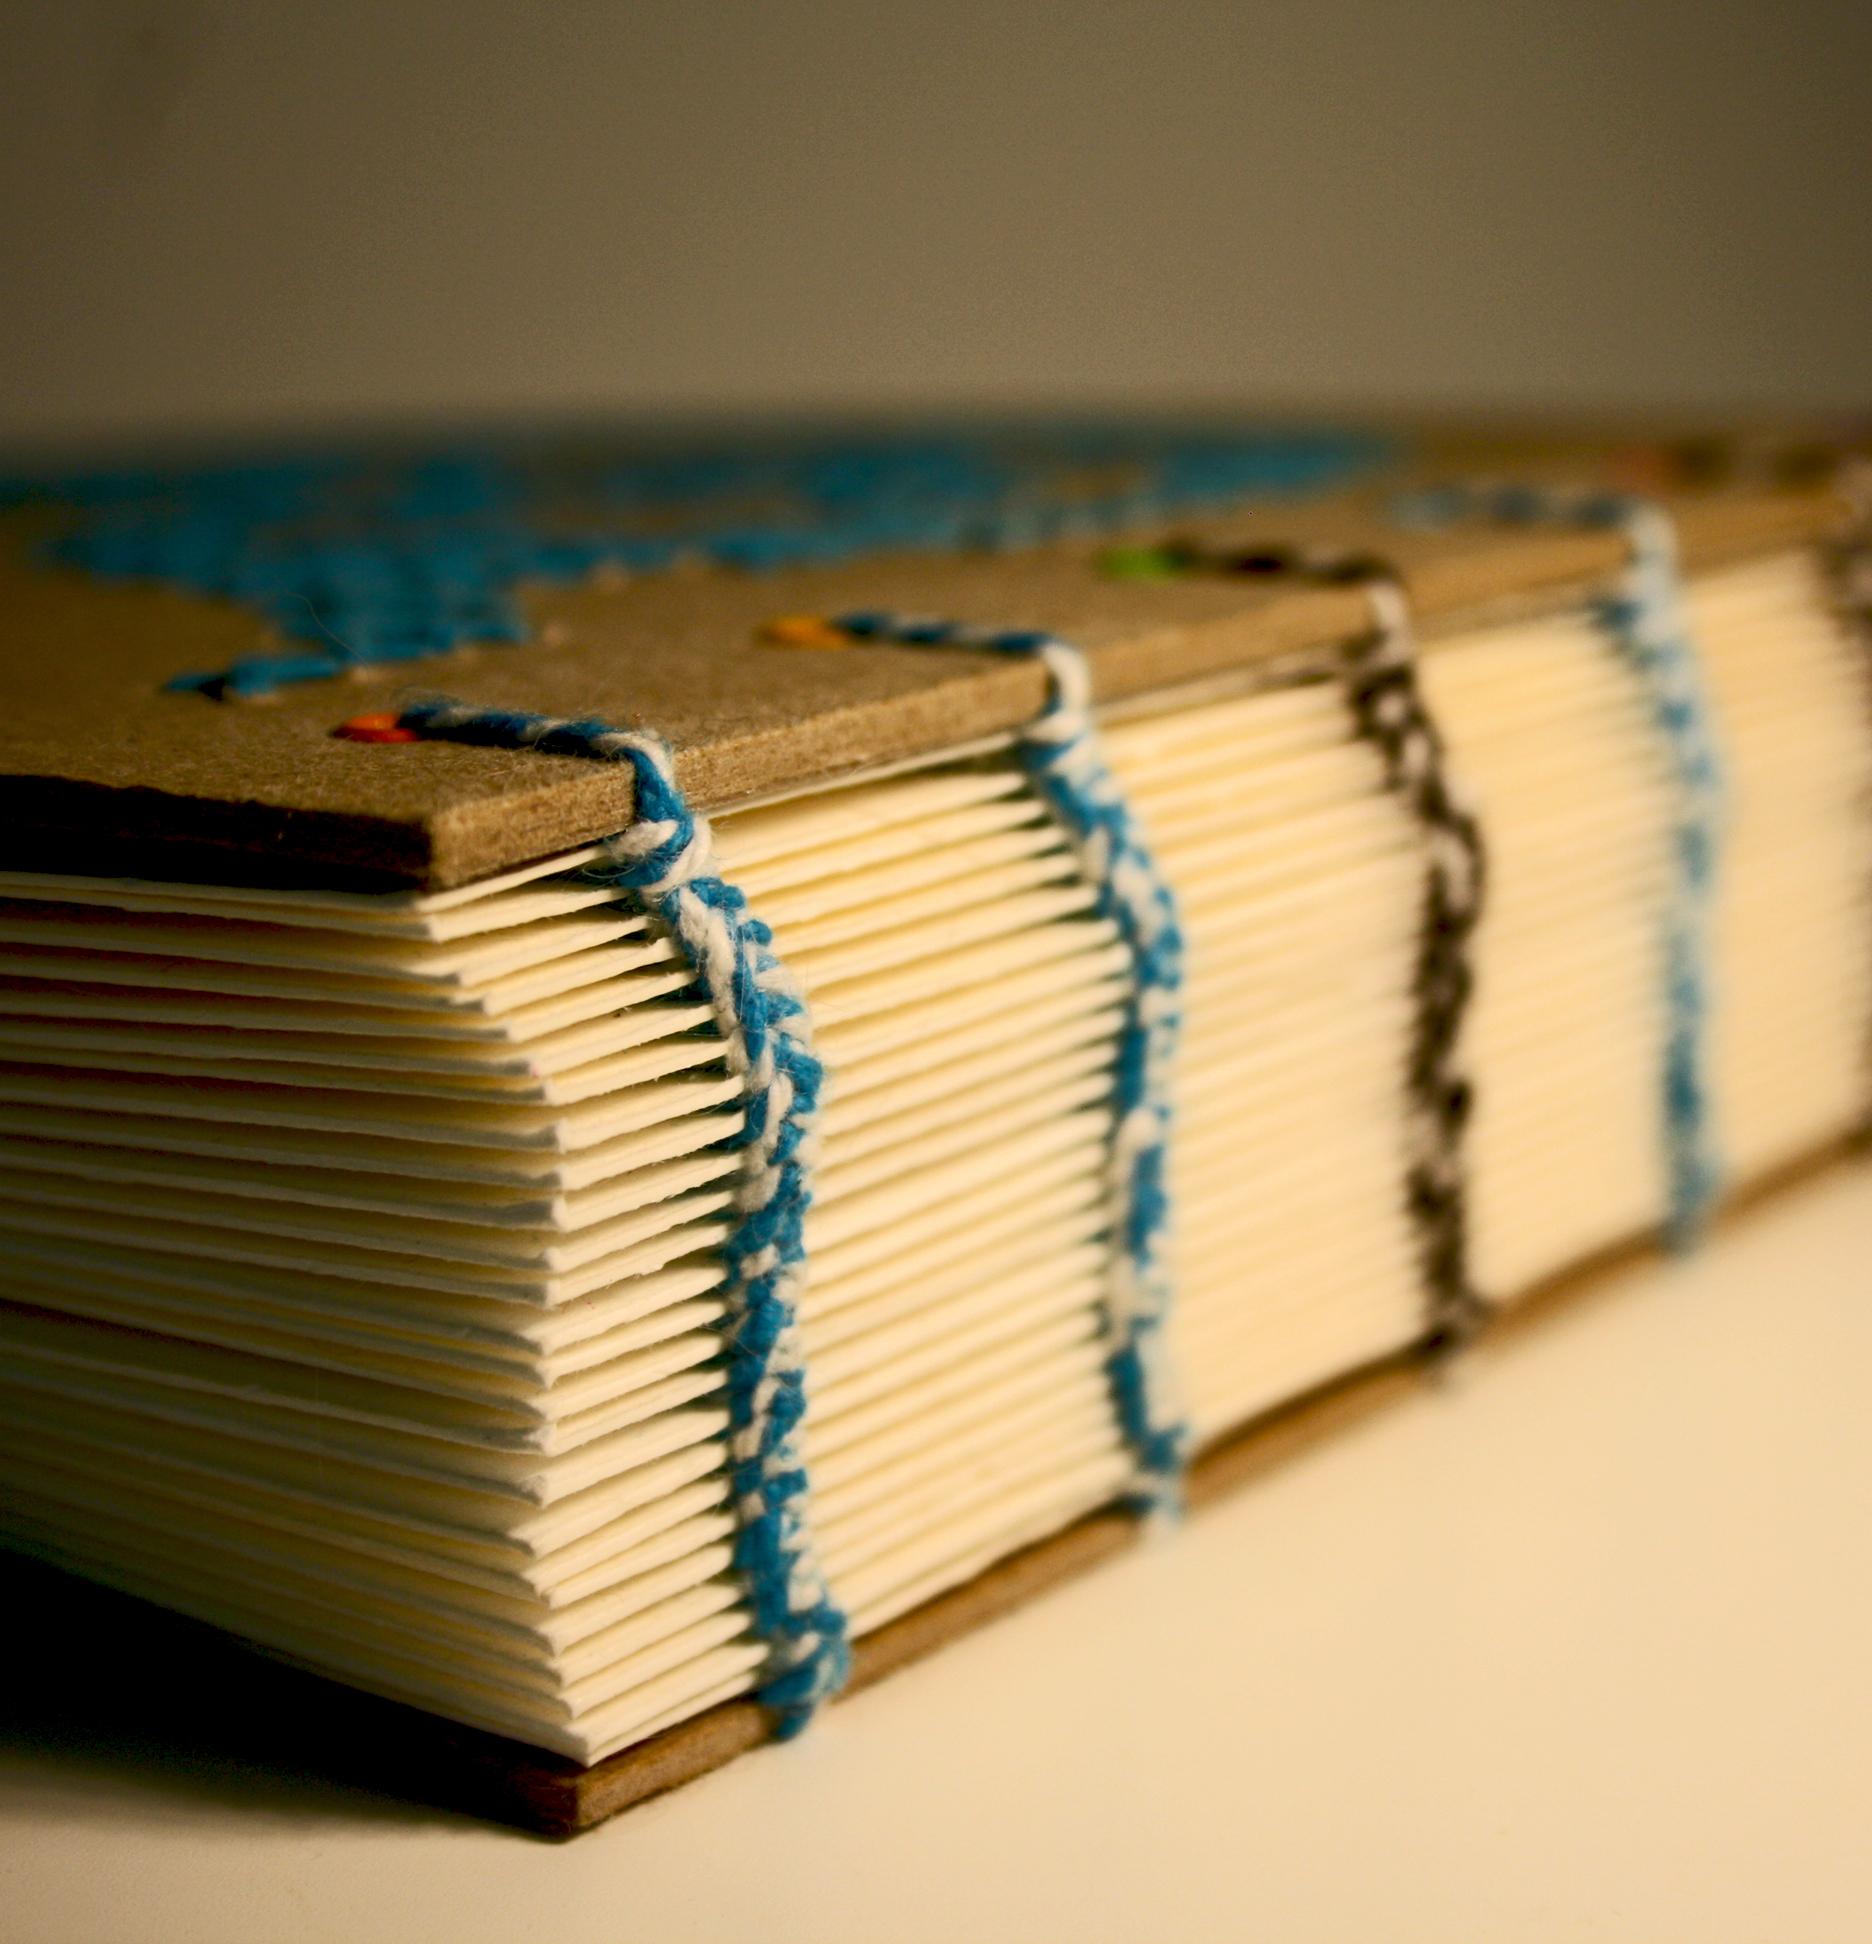 Bookbinding - Cross stitch - Create - spine.jpg